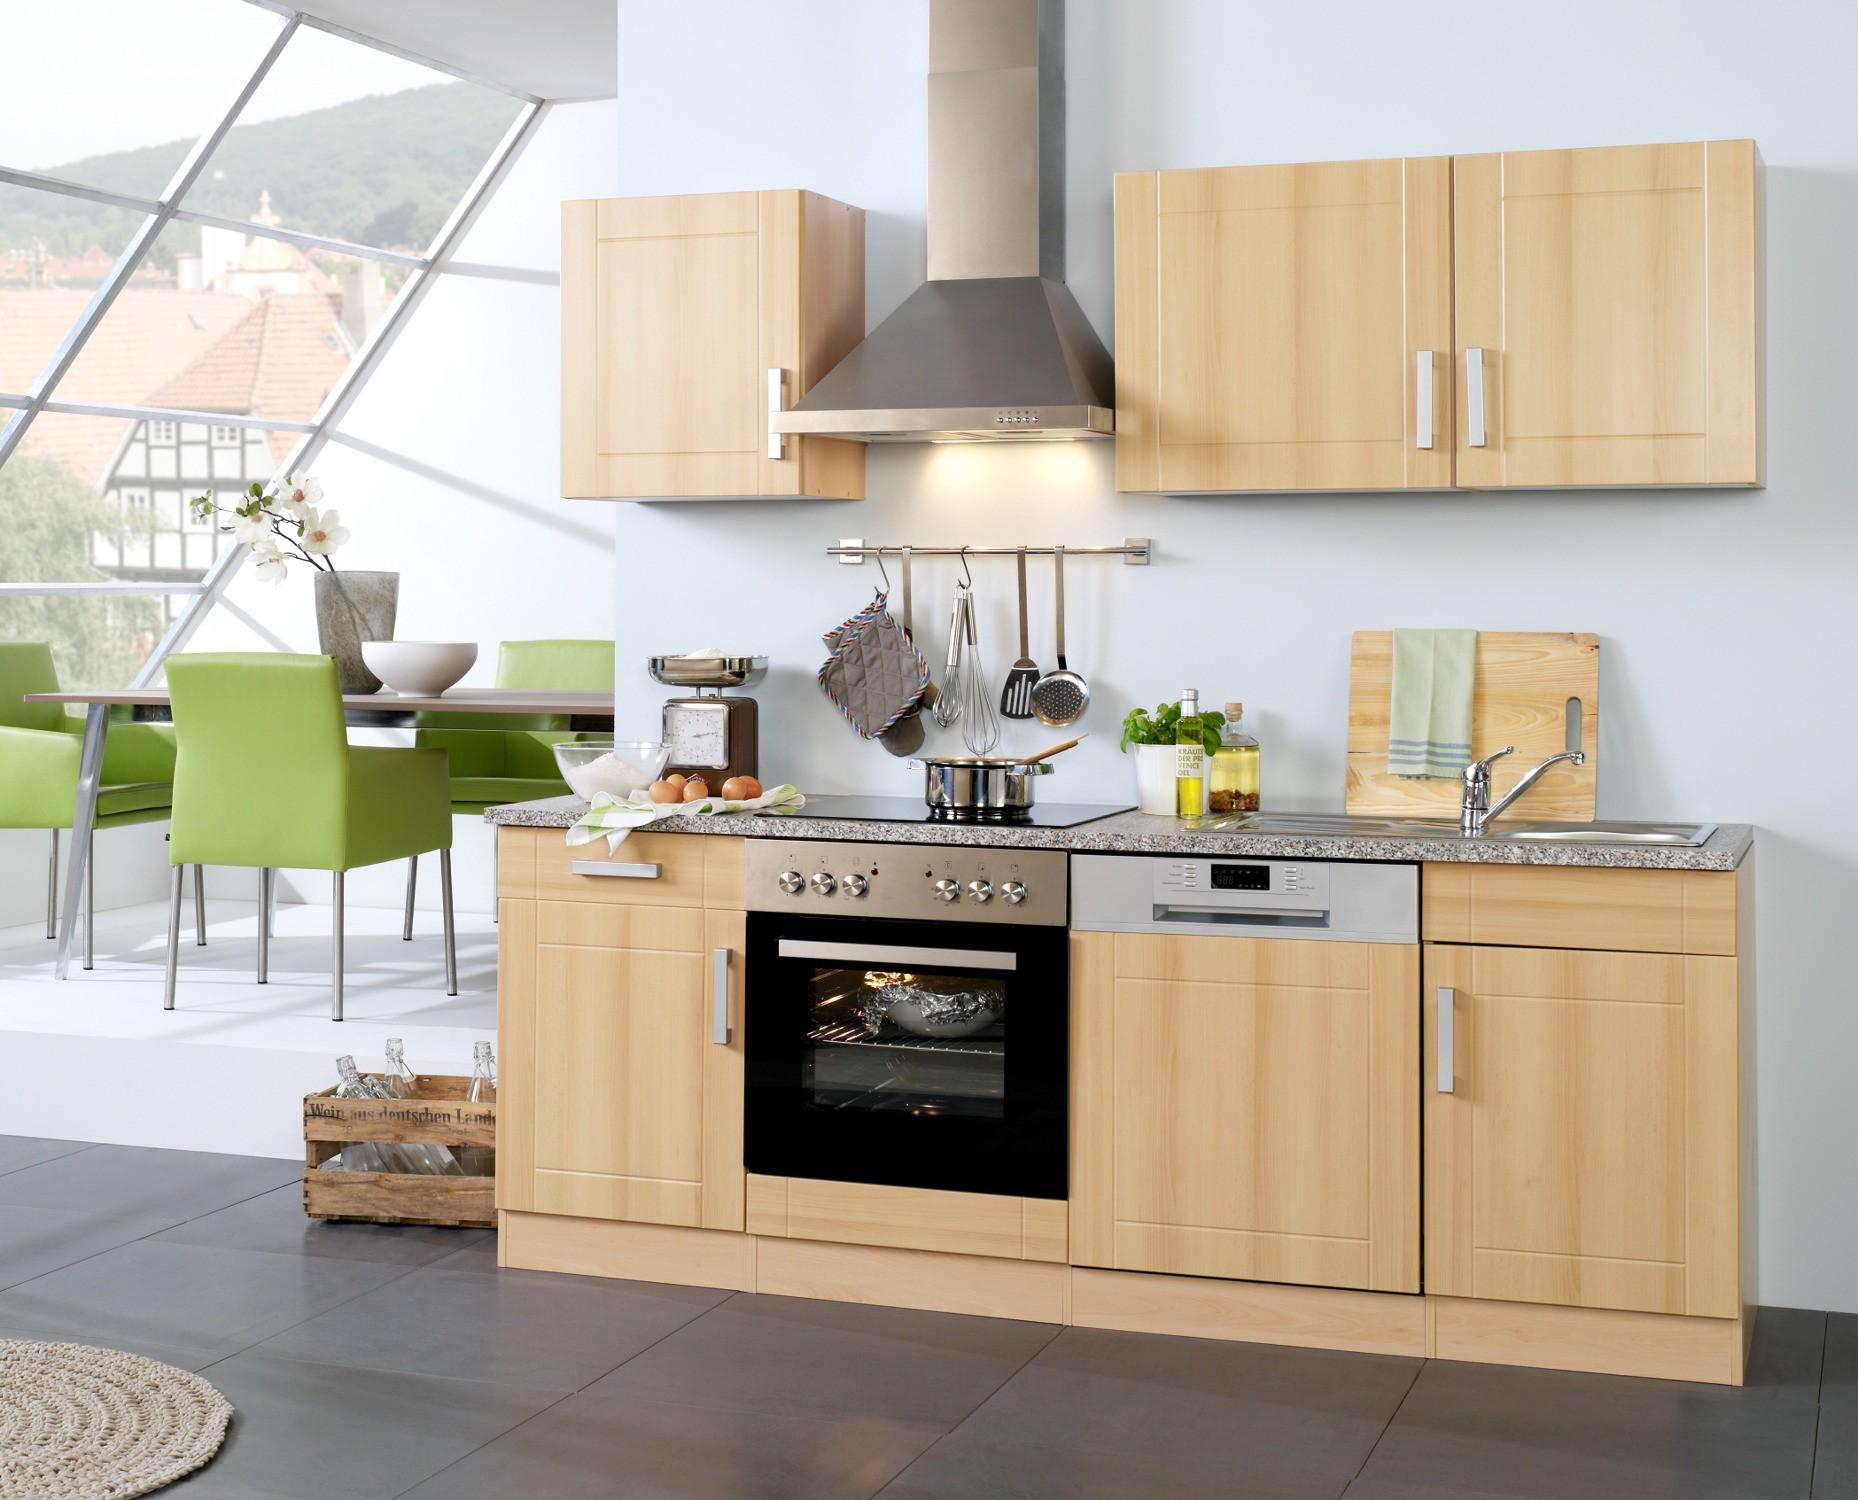 Full Size of Komplette Küche Mit Elektrogeräten Günstig Küche Mit Elektrogeräten Ikea Küche Mit Elektrogeräten Und Aufbau Küche Mit Elektrogeräten Real Küche Eckküche Mit Elektrogeräten